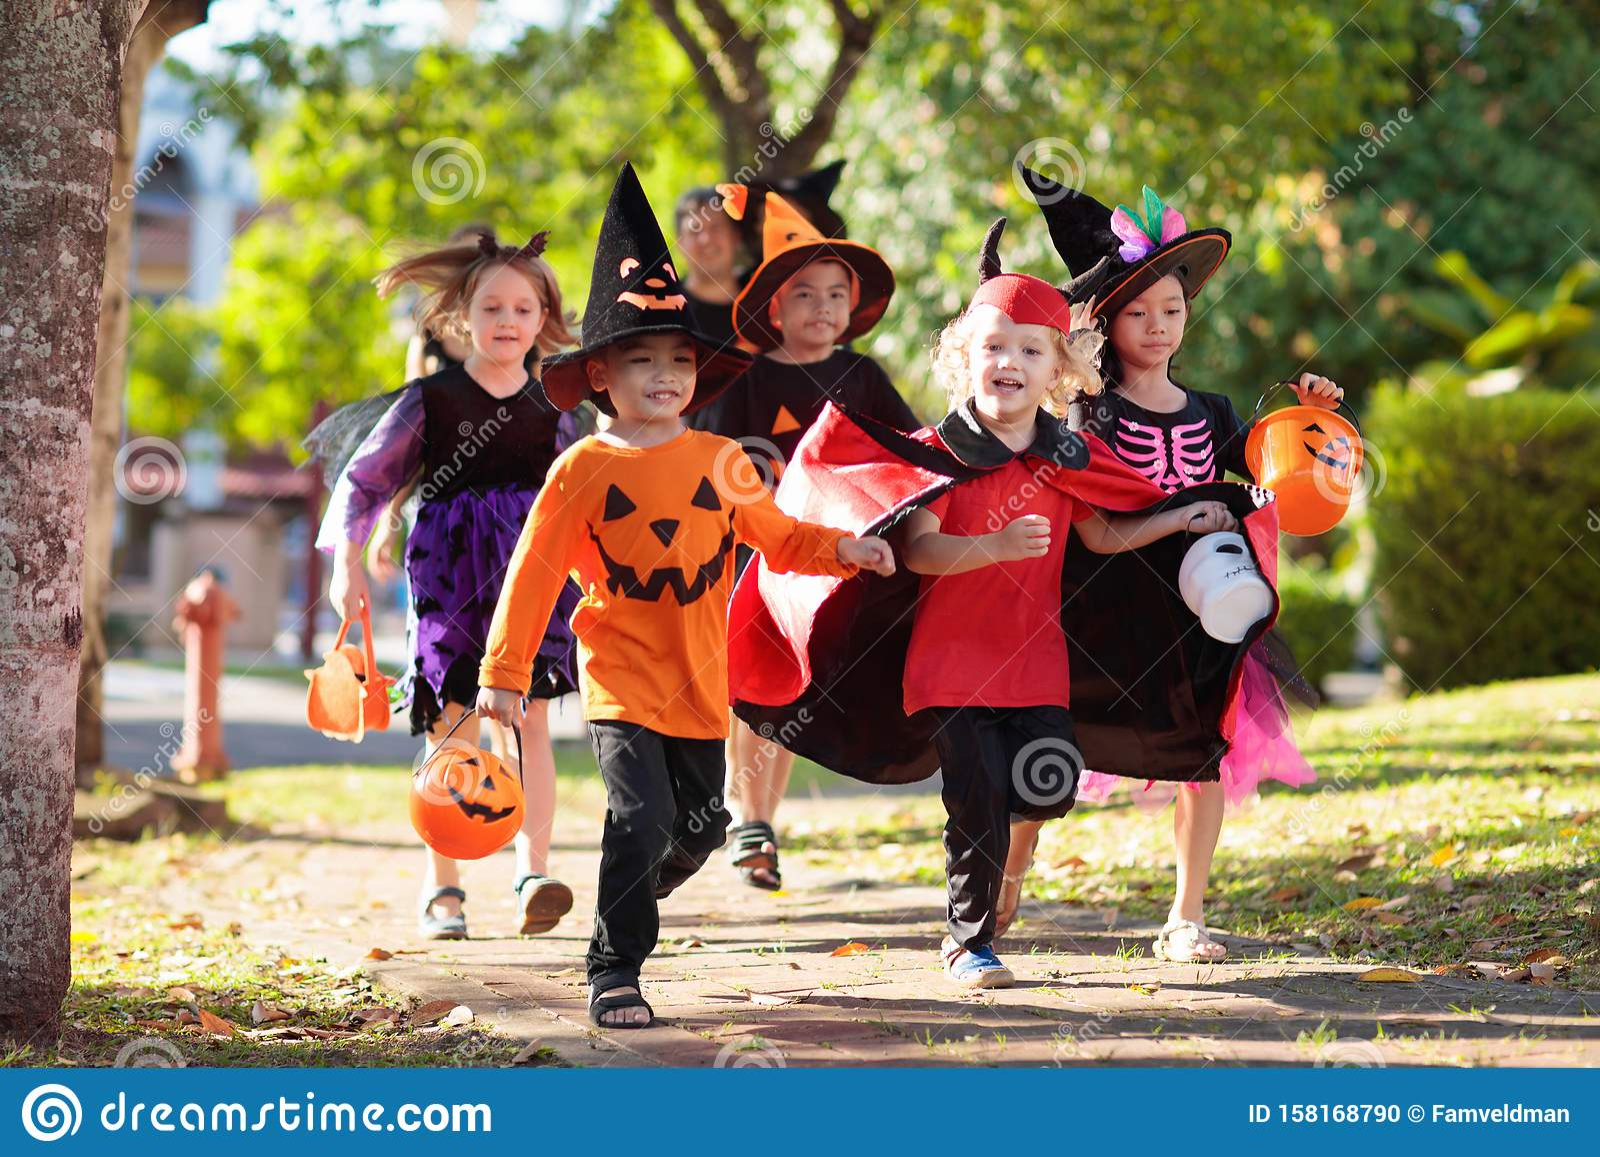 Kids trick or treat. Halloween fun for children